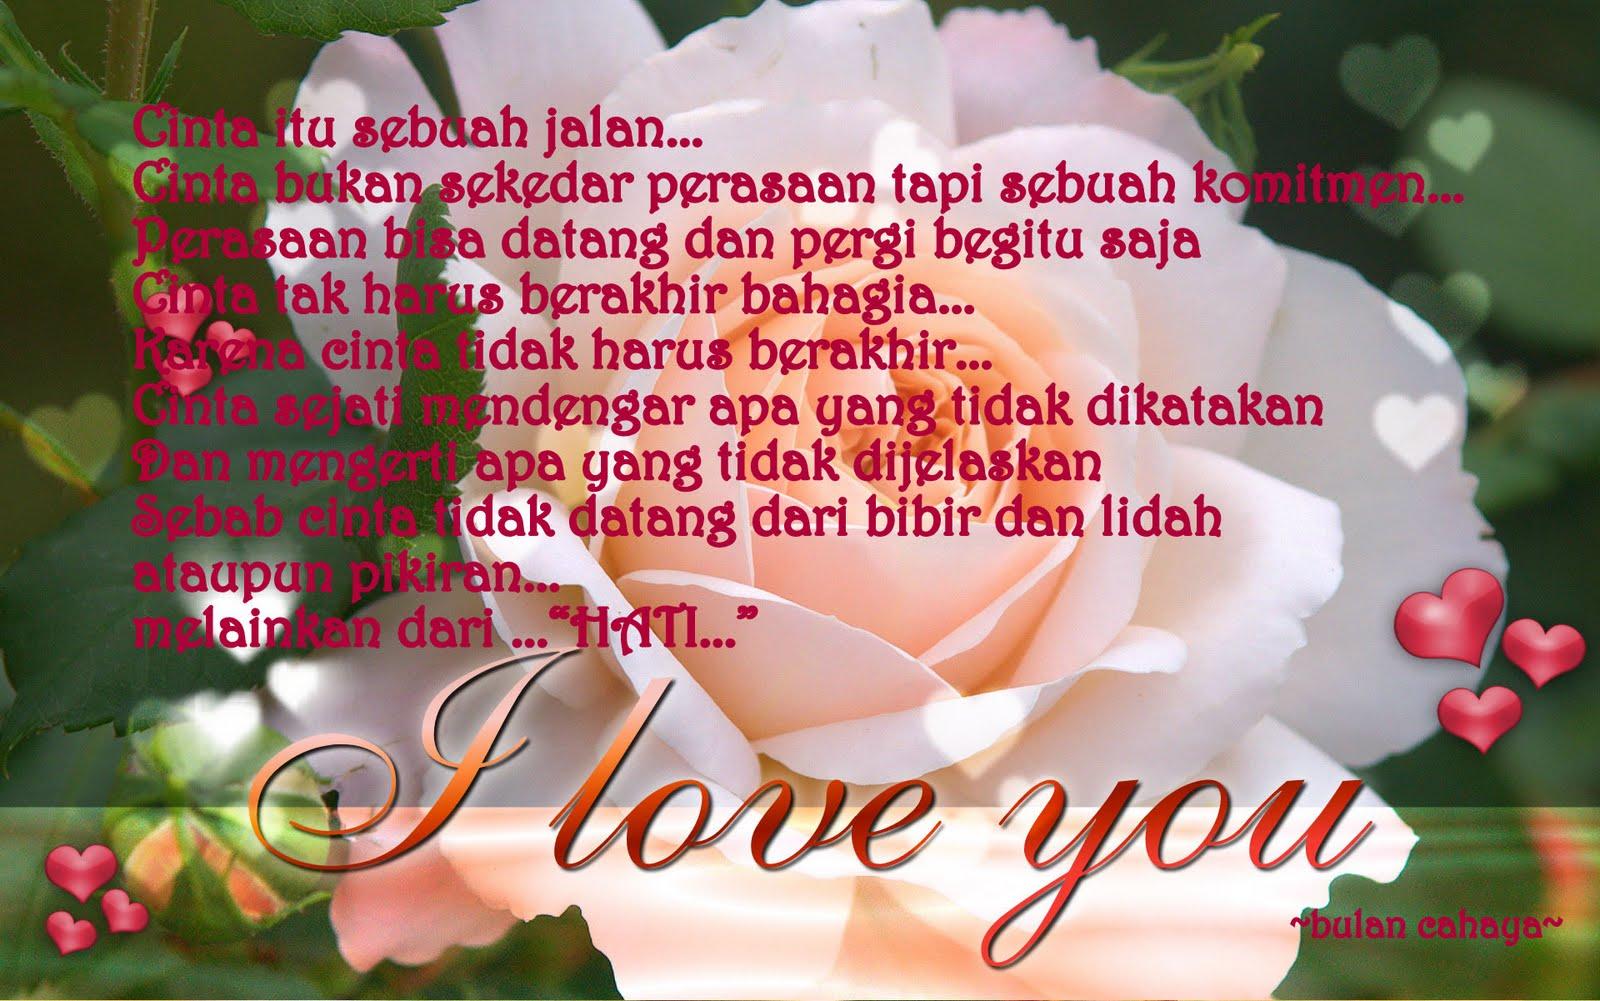 Kata Mutiara Penuh Cinta 2013